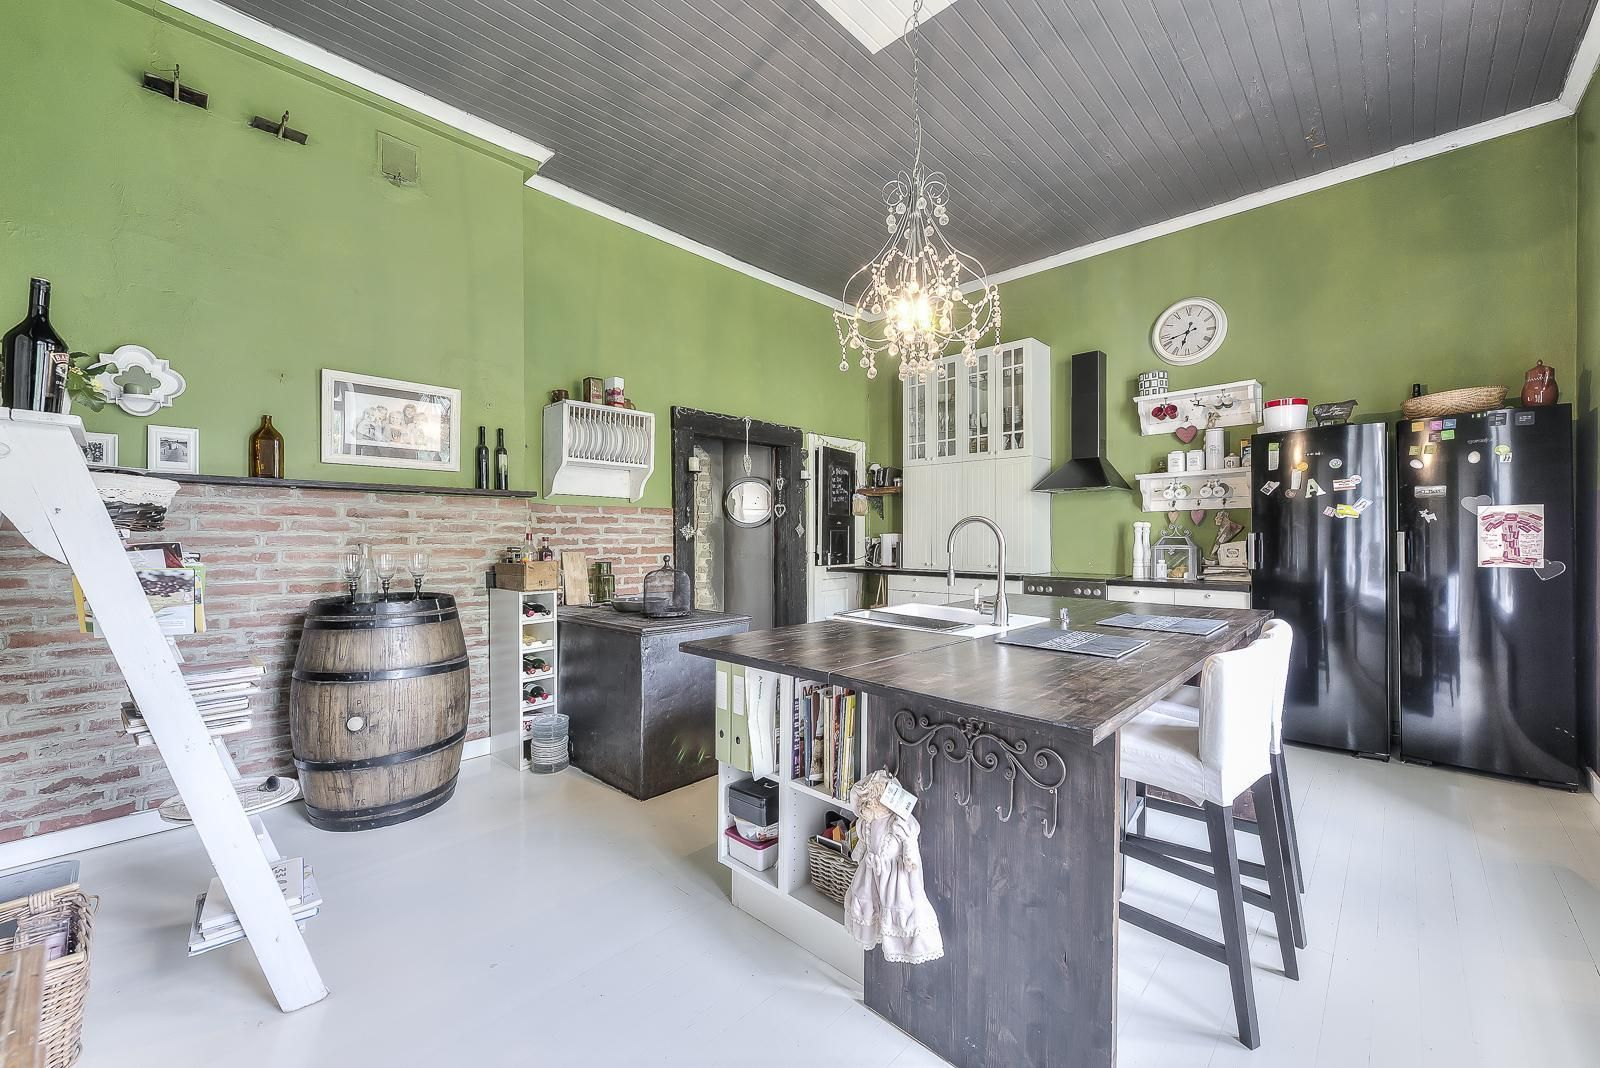 Urjala- Kitchen - for sale!